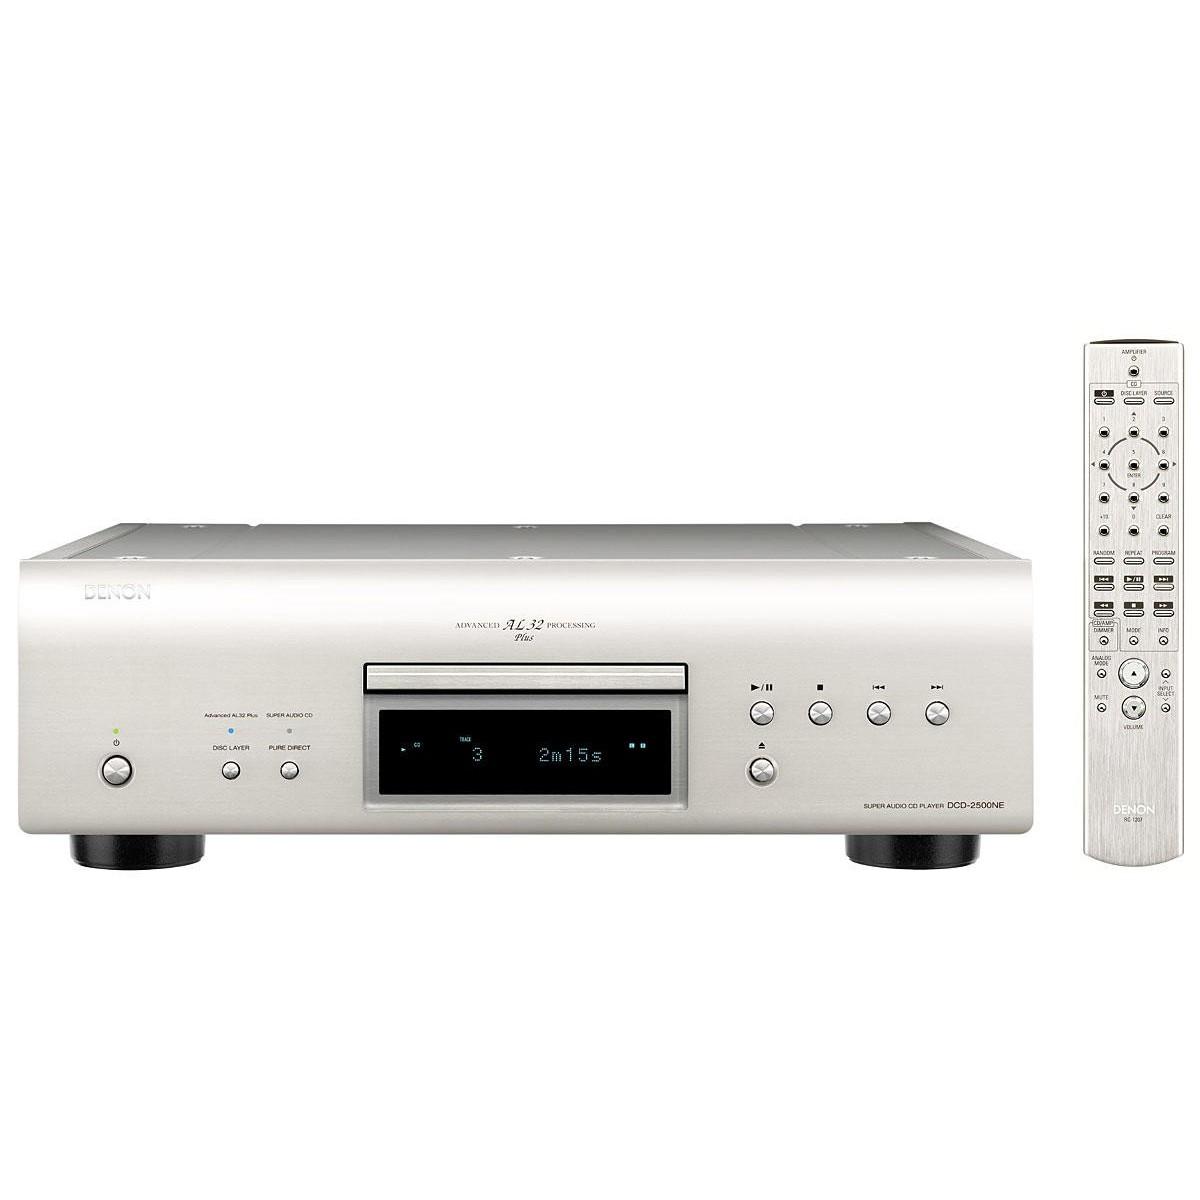 SACD-Player DCD-2500NE (inkl. 5 Jahren Garantie!)